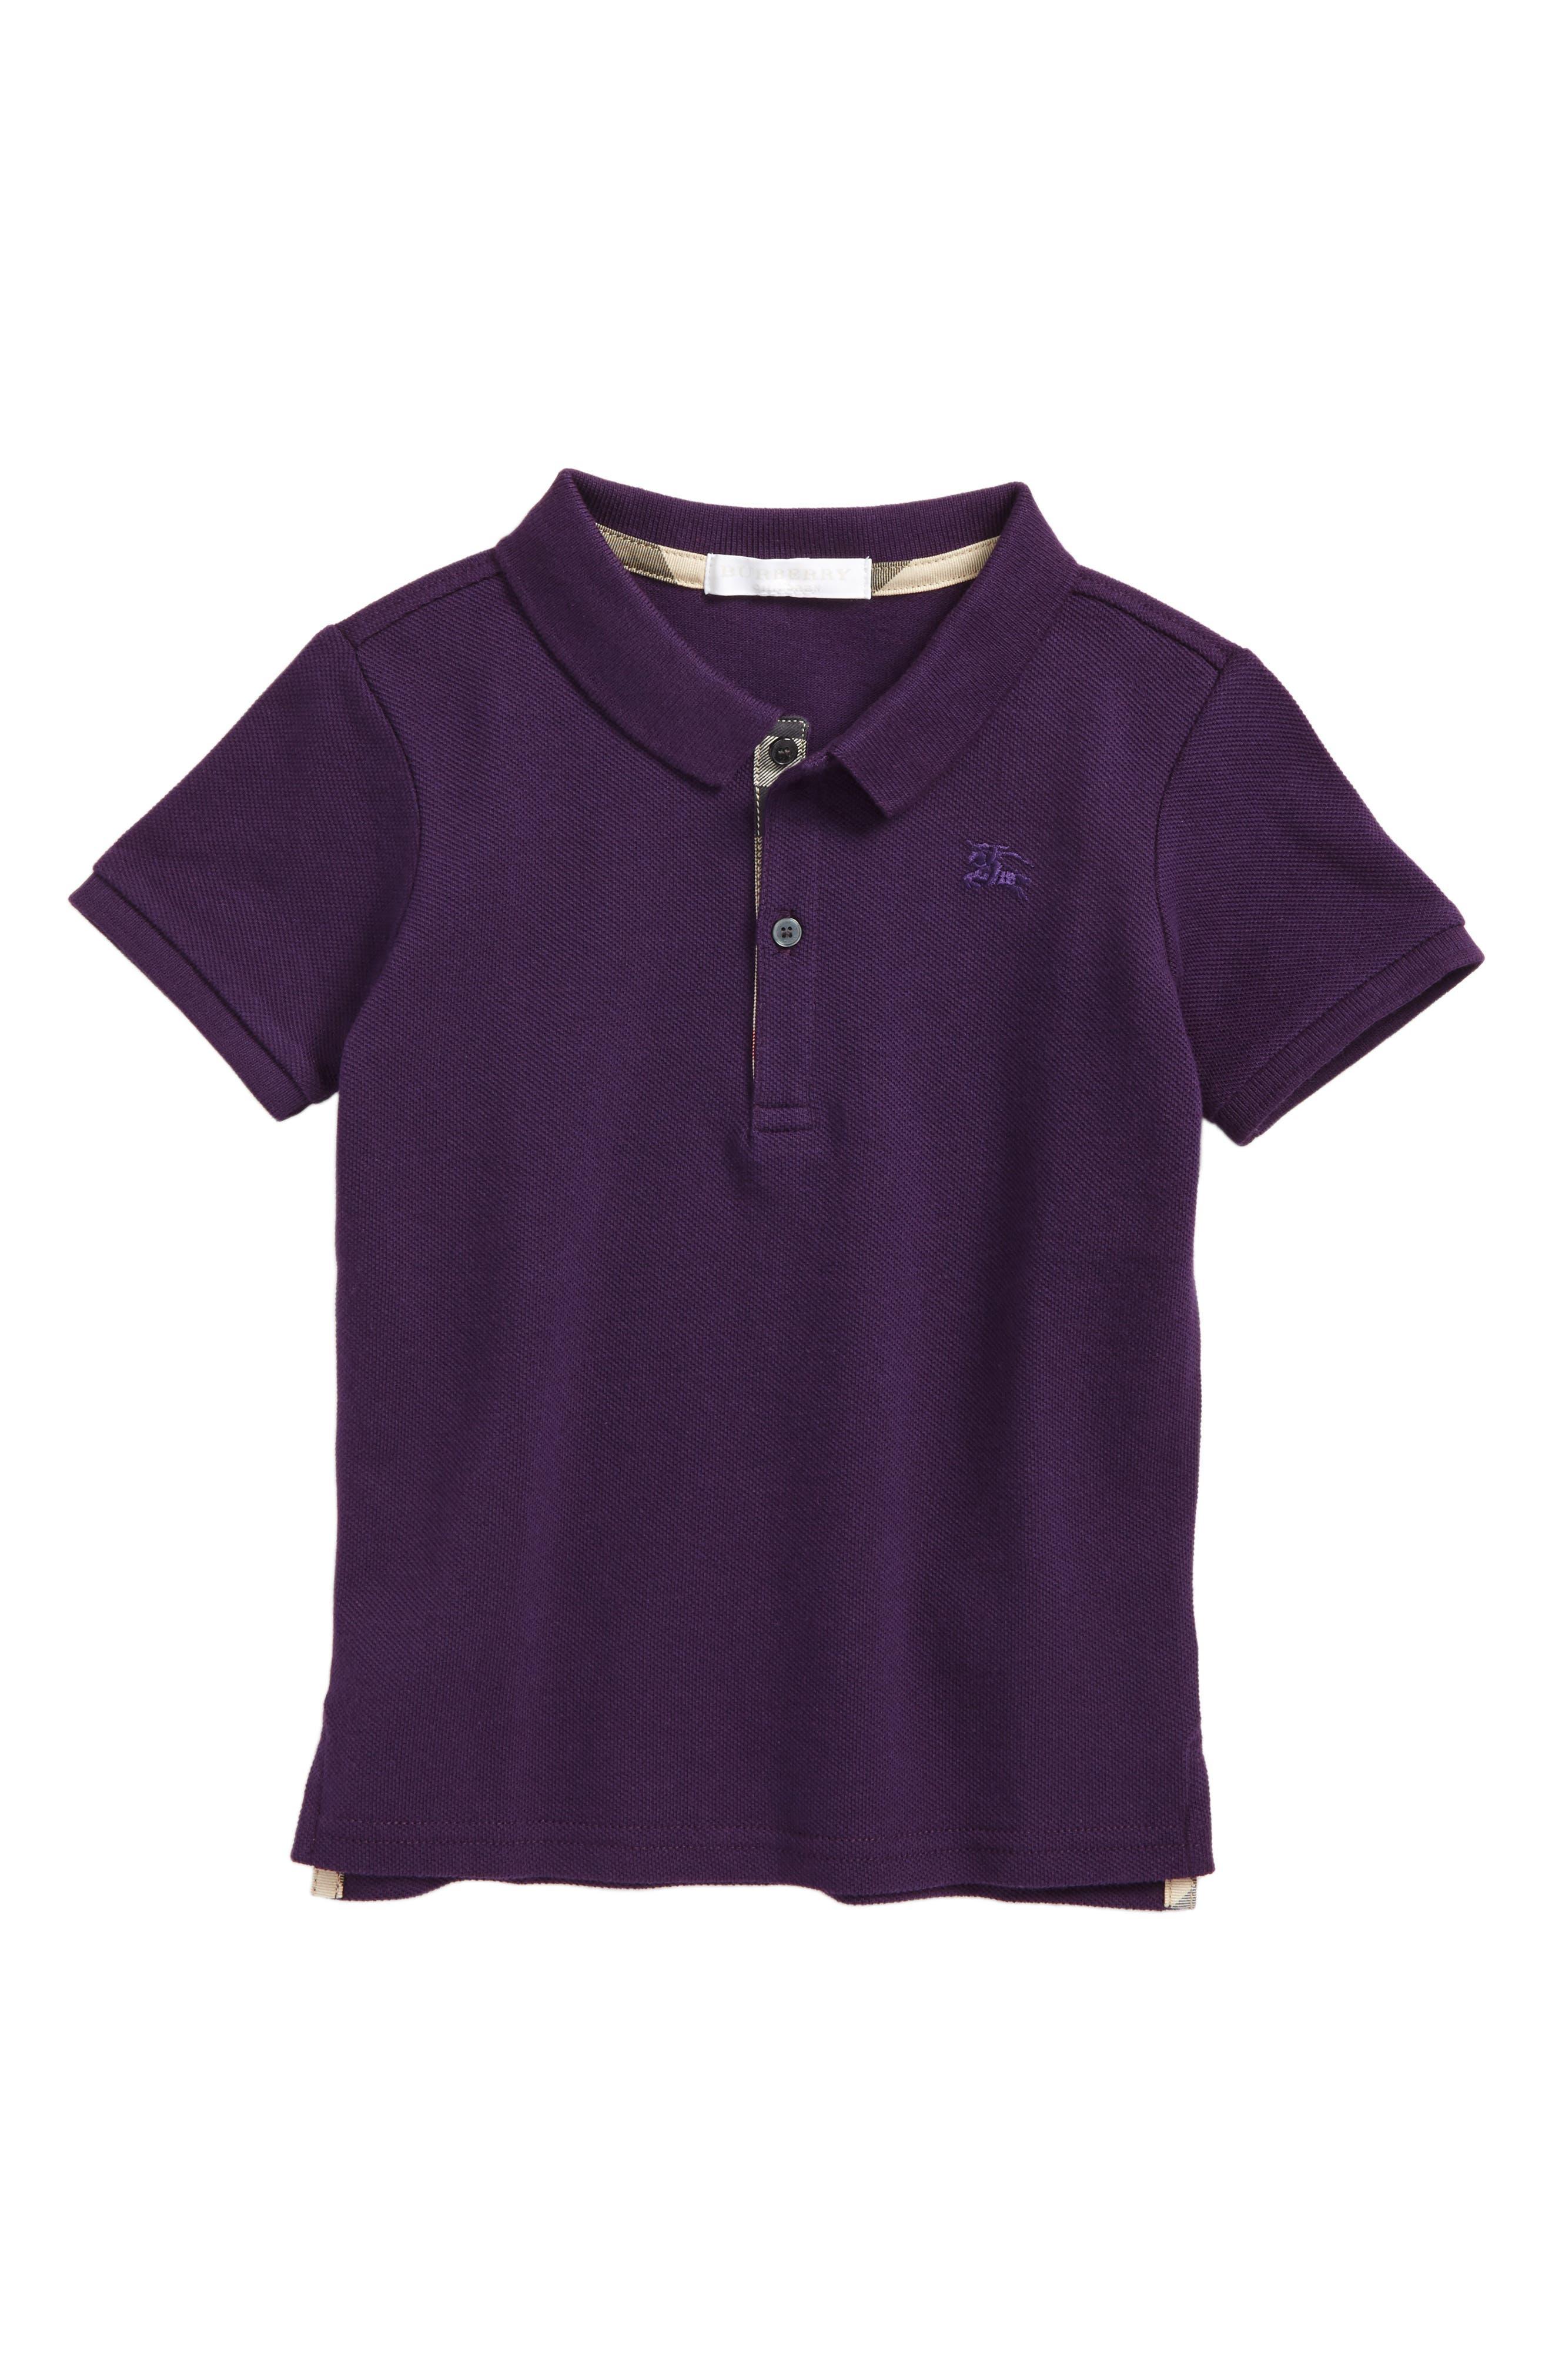 Palmer Piqué Polo,                         Main,                         color, Purple Grape